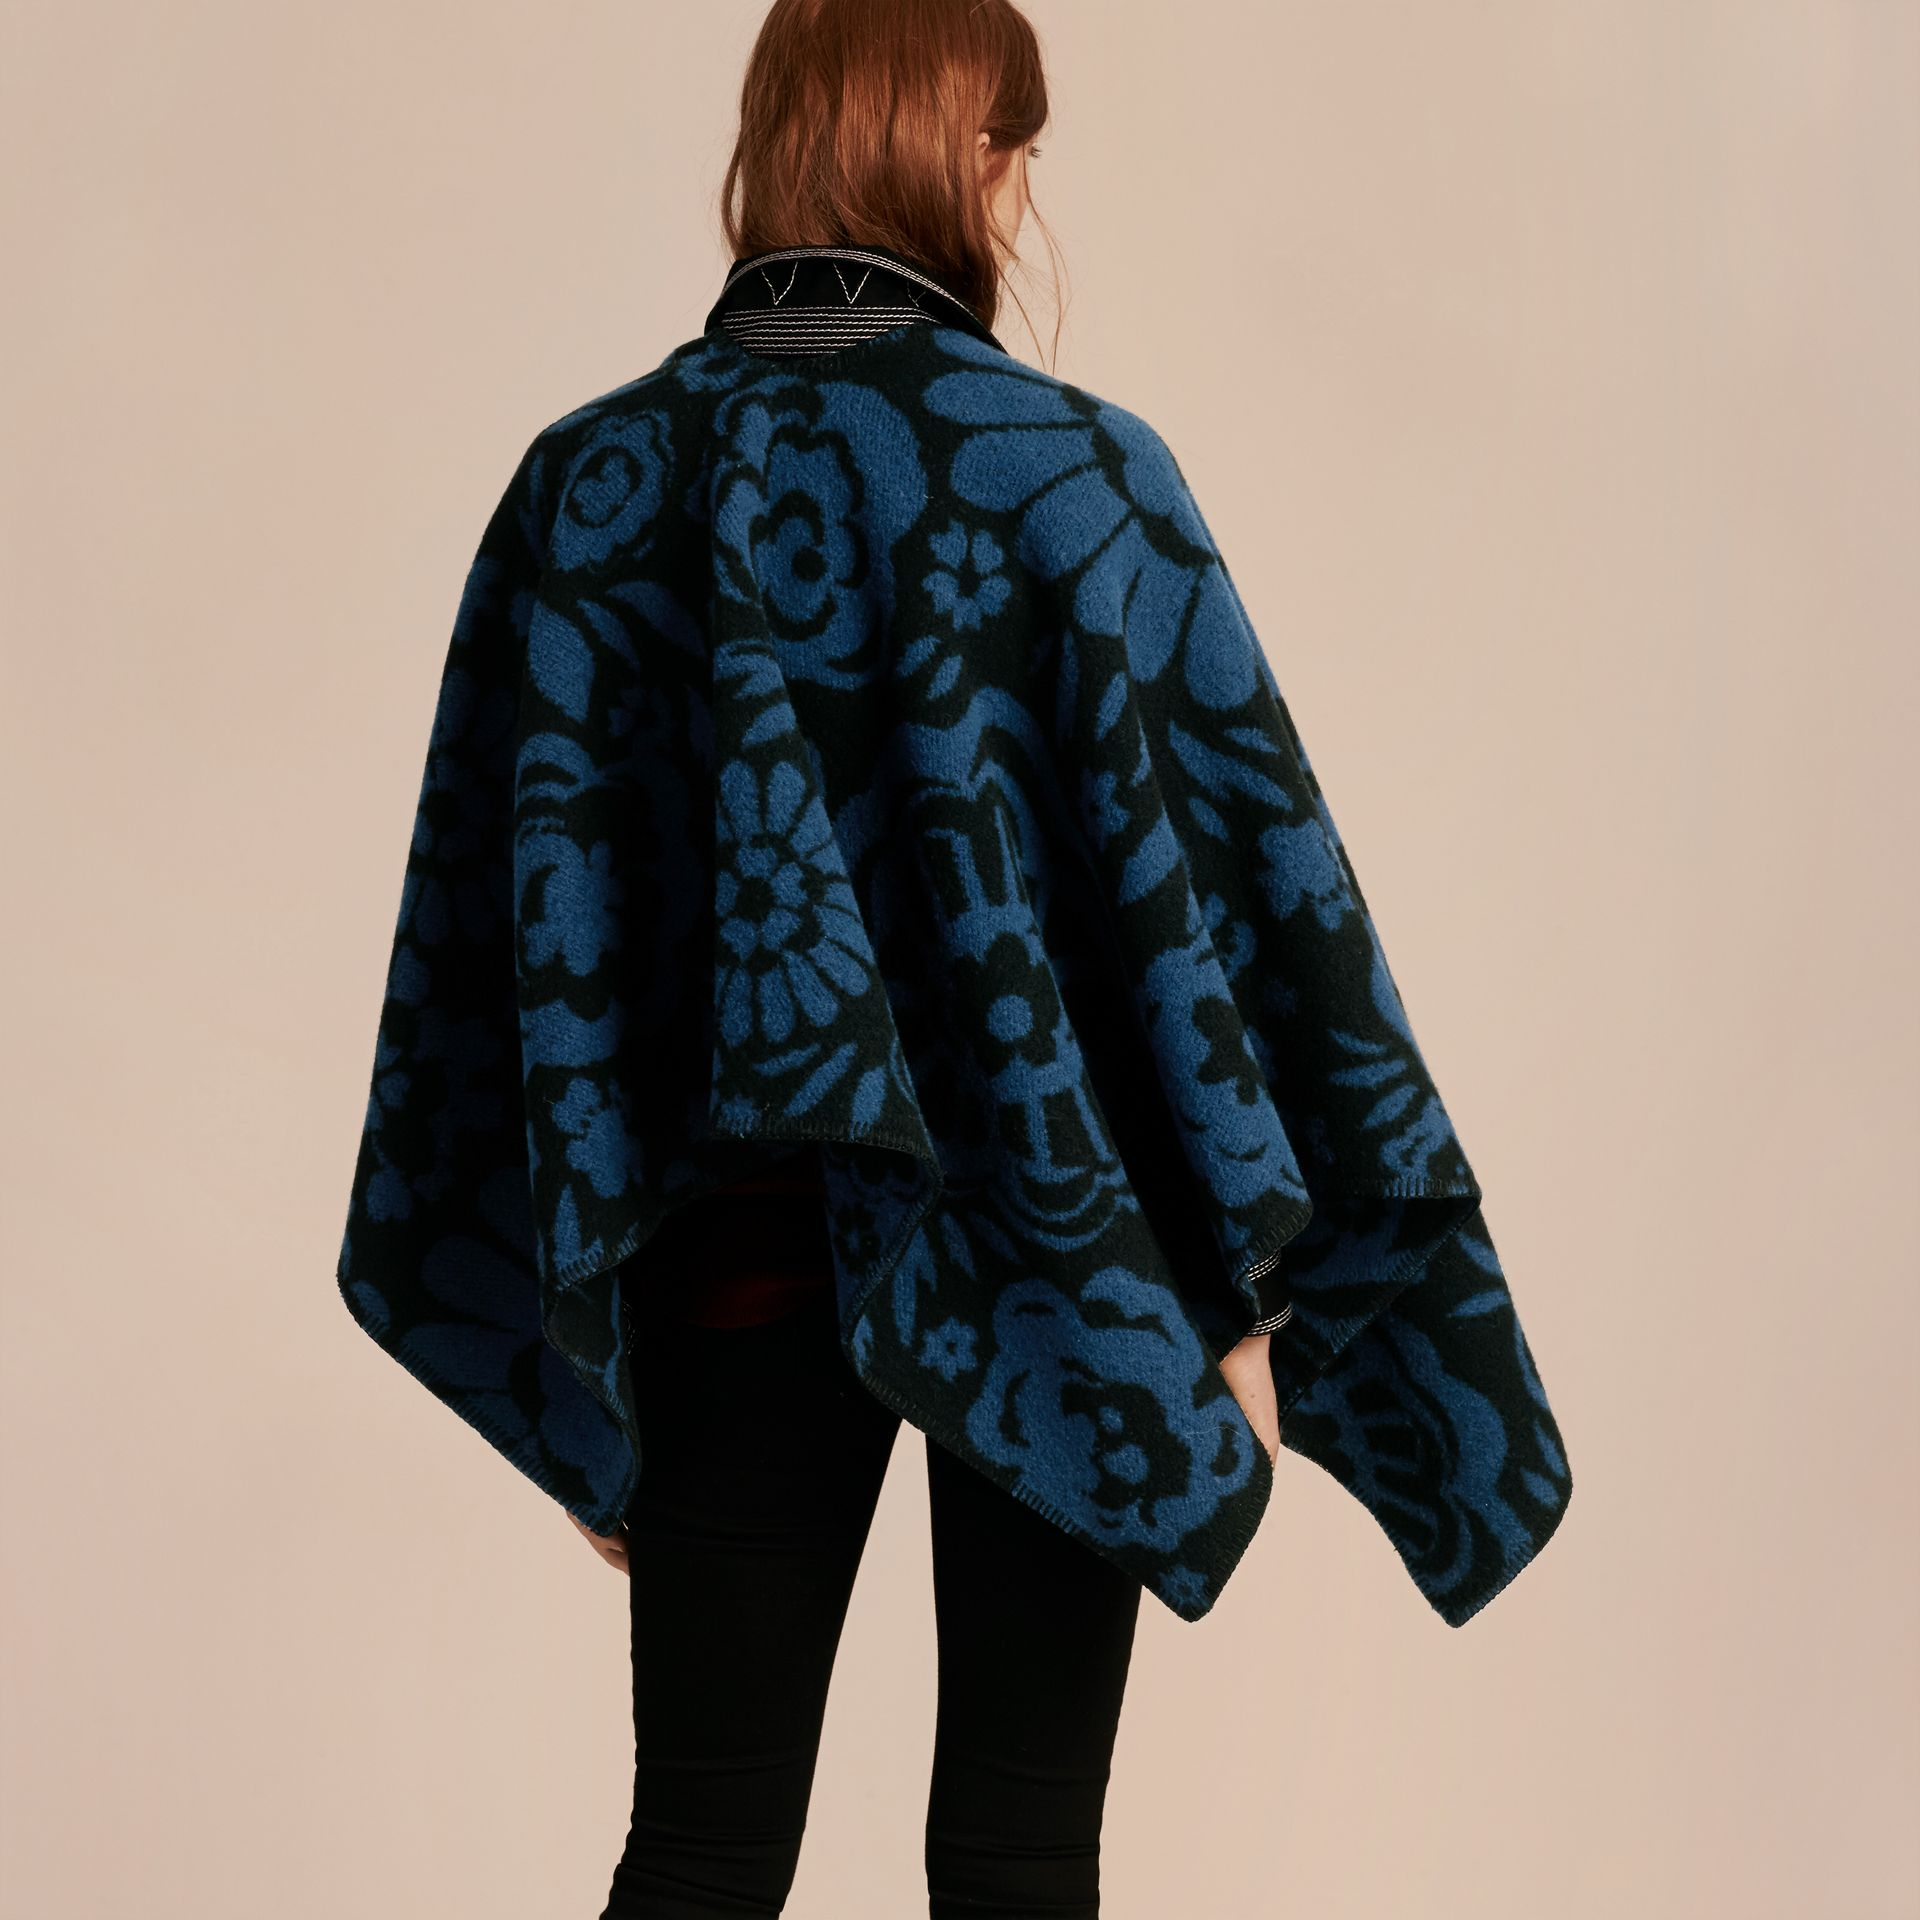 Ozeanblau Jacquard-Poncho aus Wolle und Kaschmir mit floralem Muster - Galerie-Bild 3